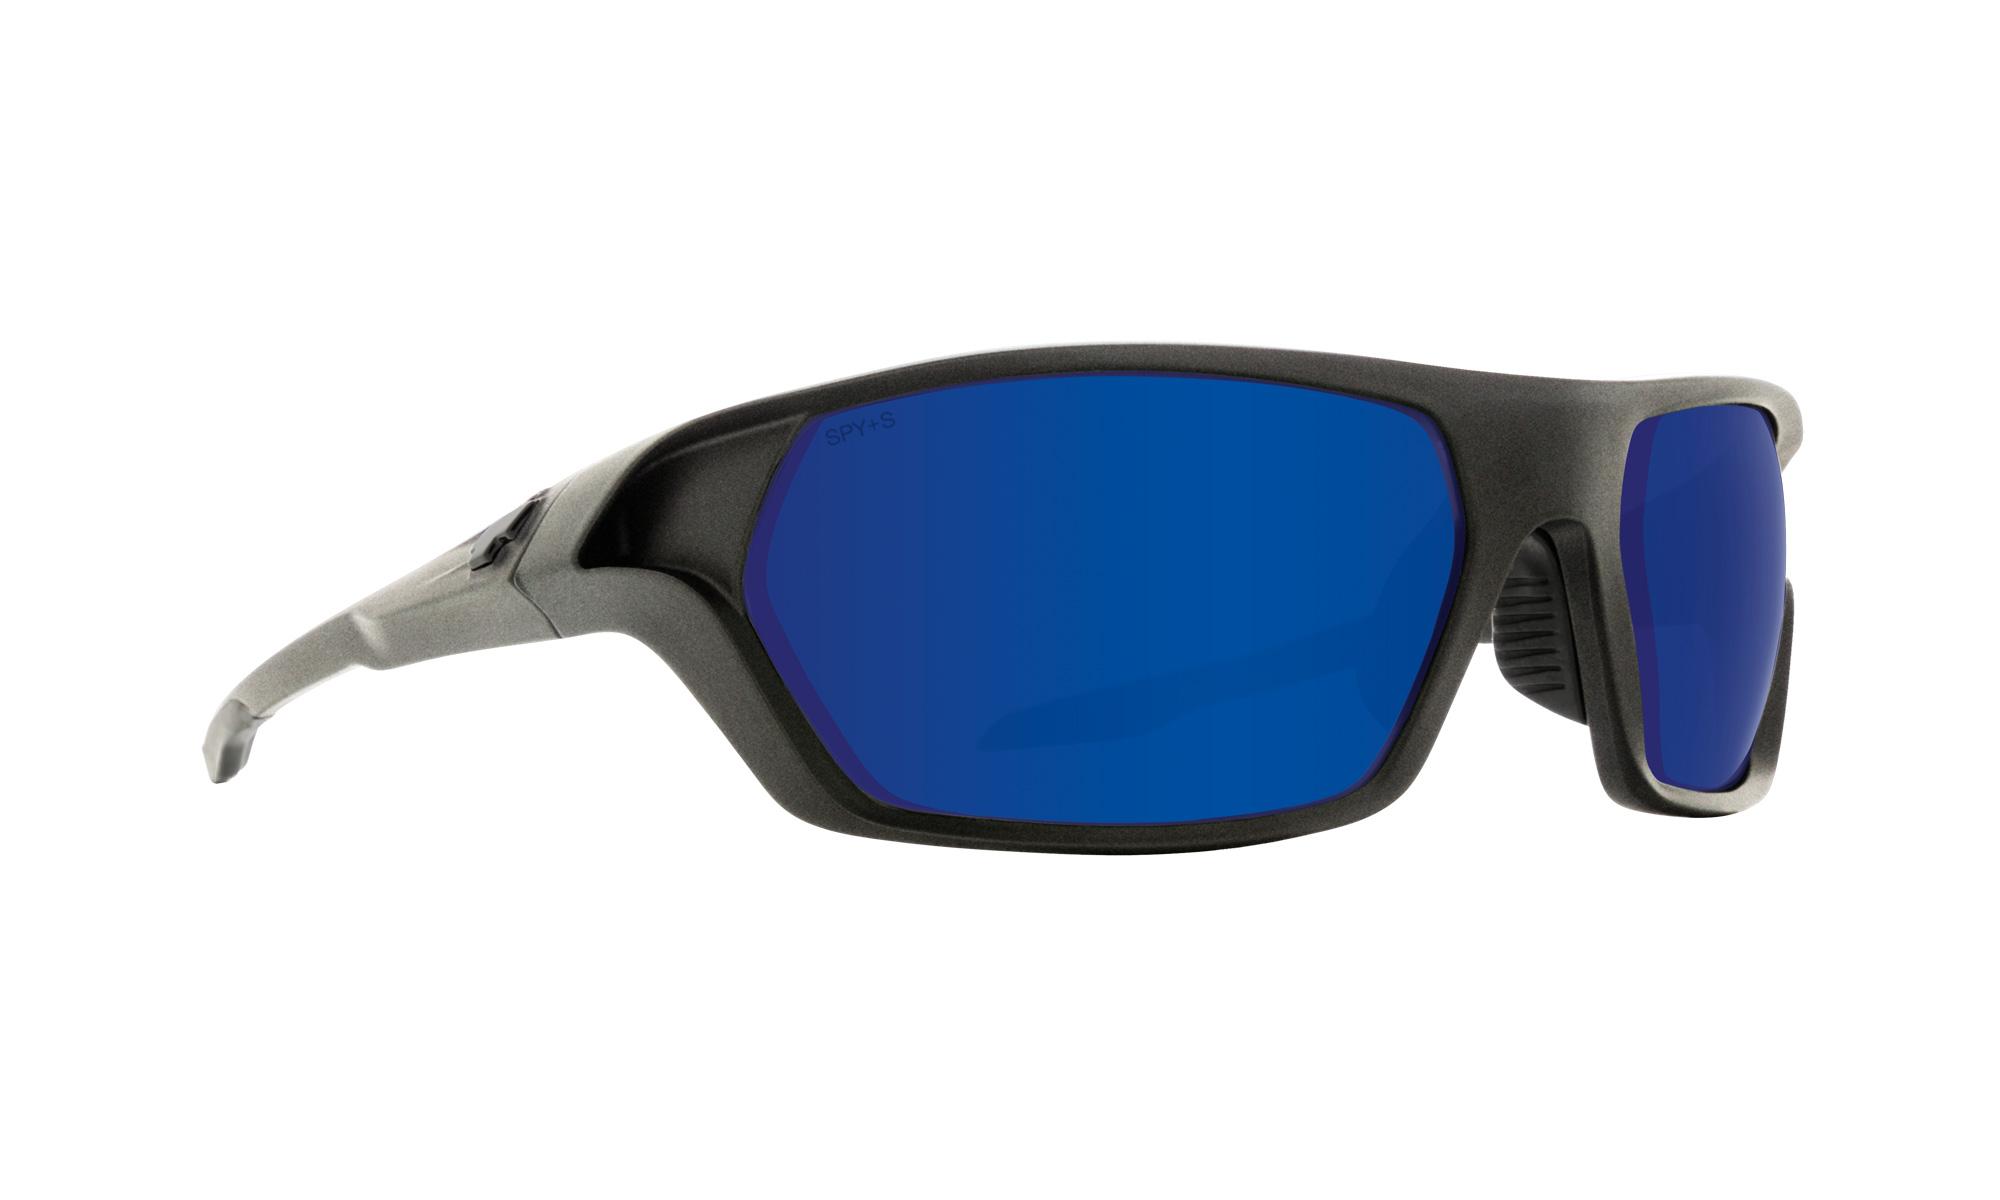 ad7cd72058 Spy Optic Quanta 2 Sunglasses